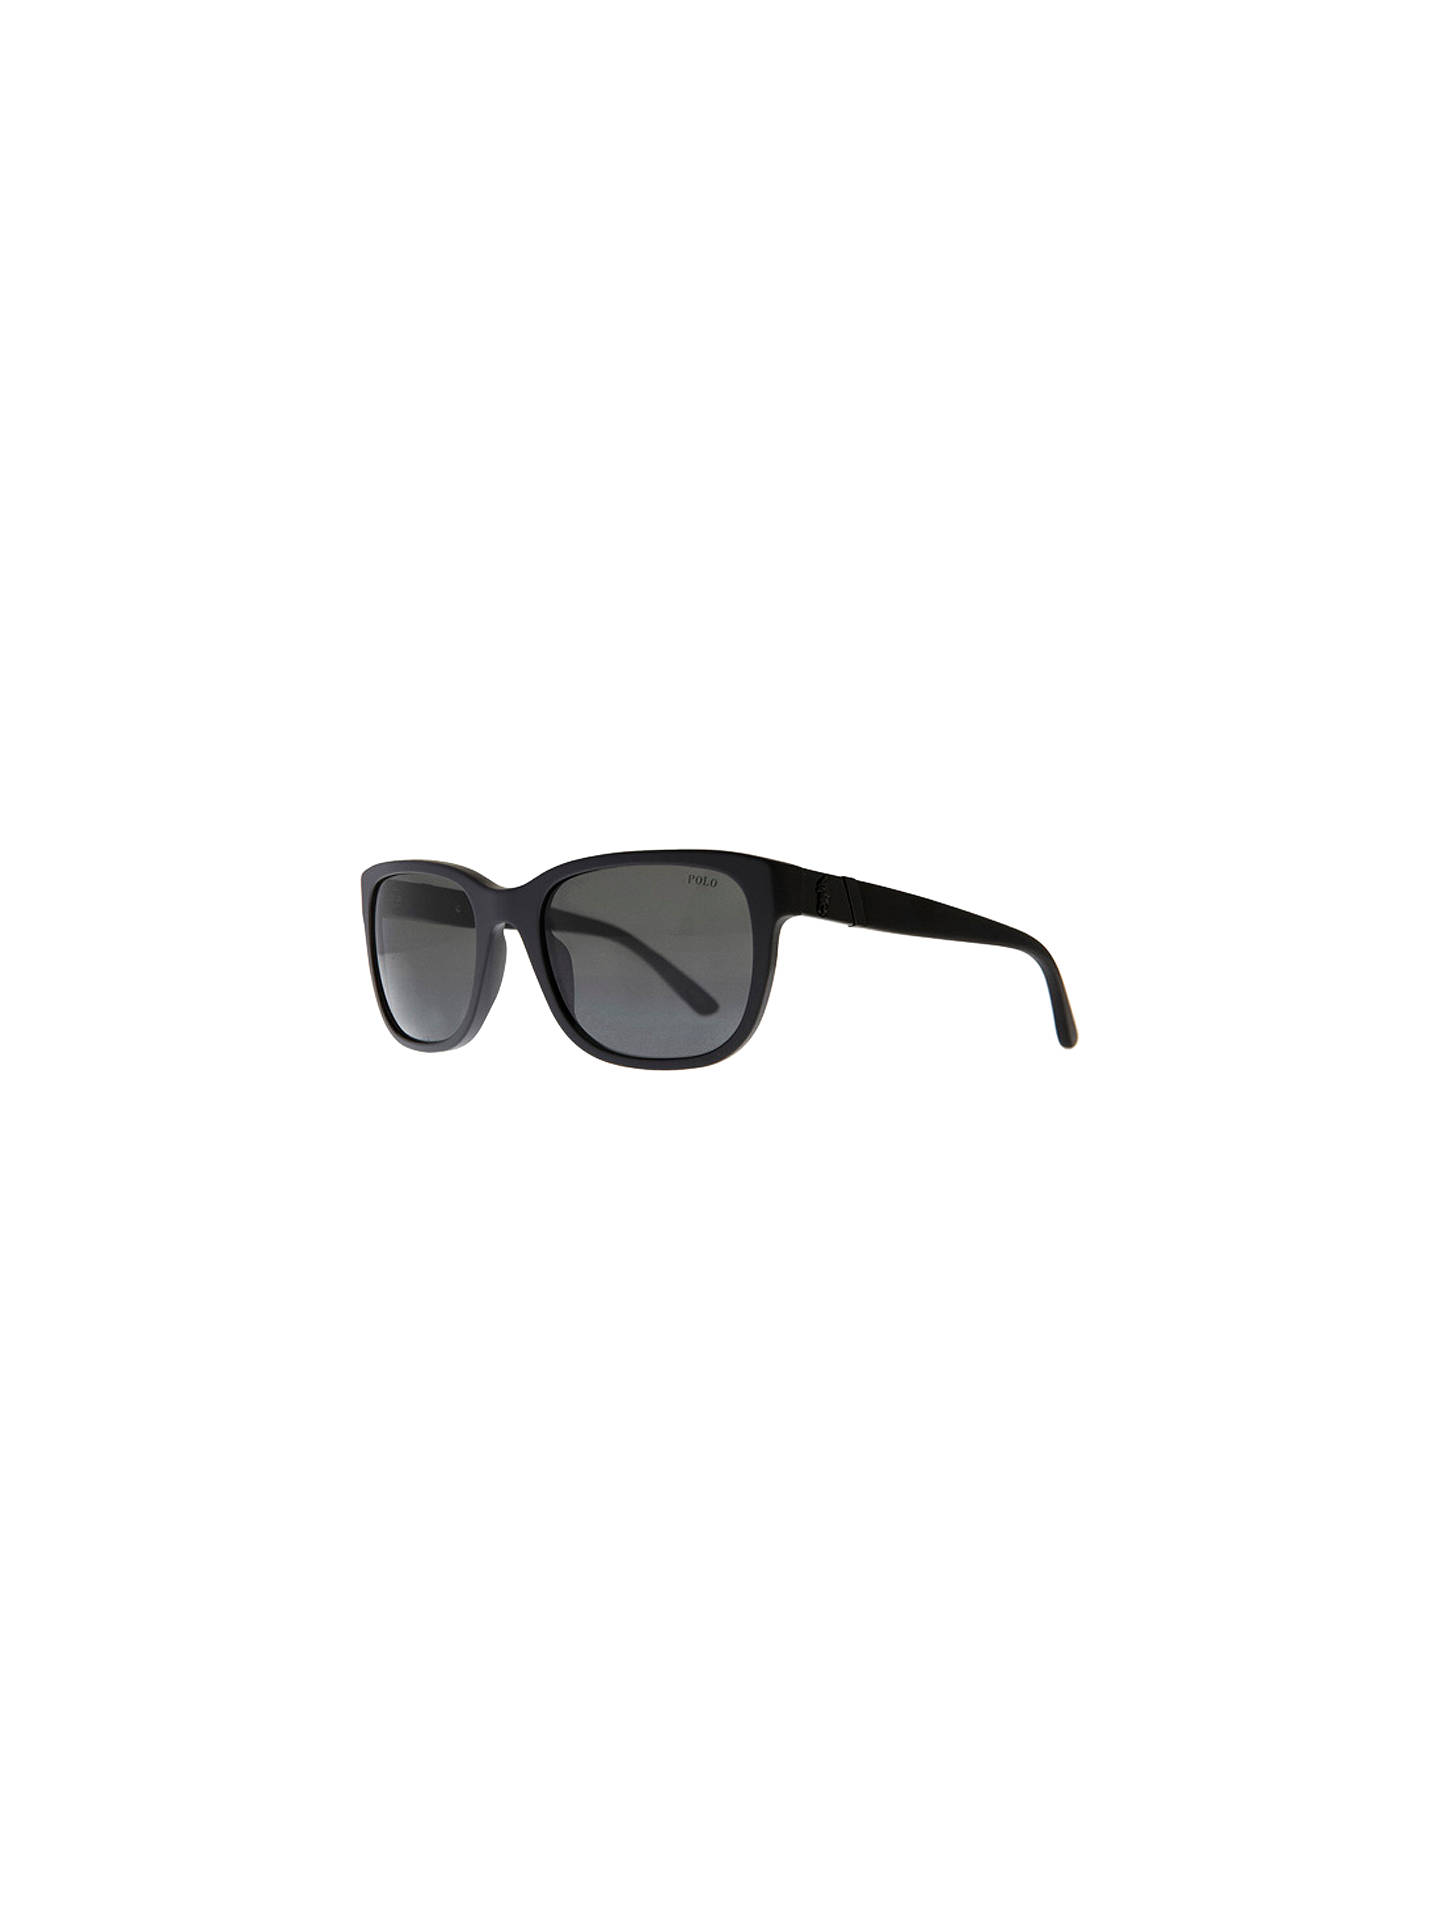 403d8af7fb67 Buy Polo Ralph Lauren PH3066 Pony Player Sunglasses, Matte Black Online at  johnlewis.com ...